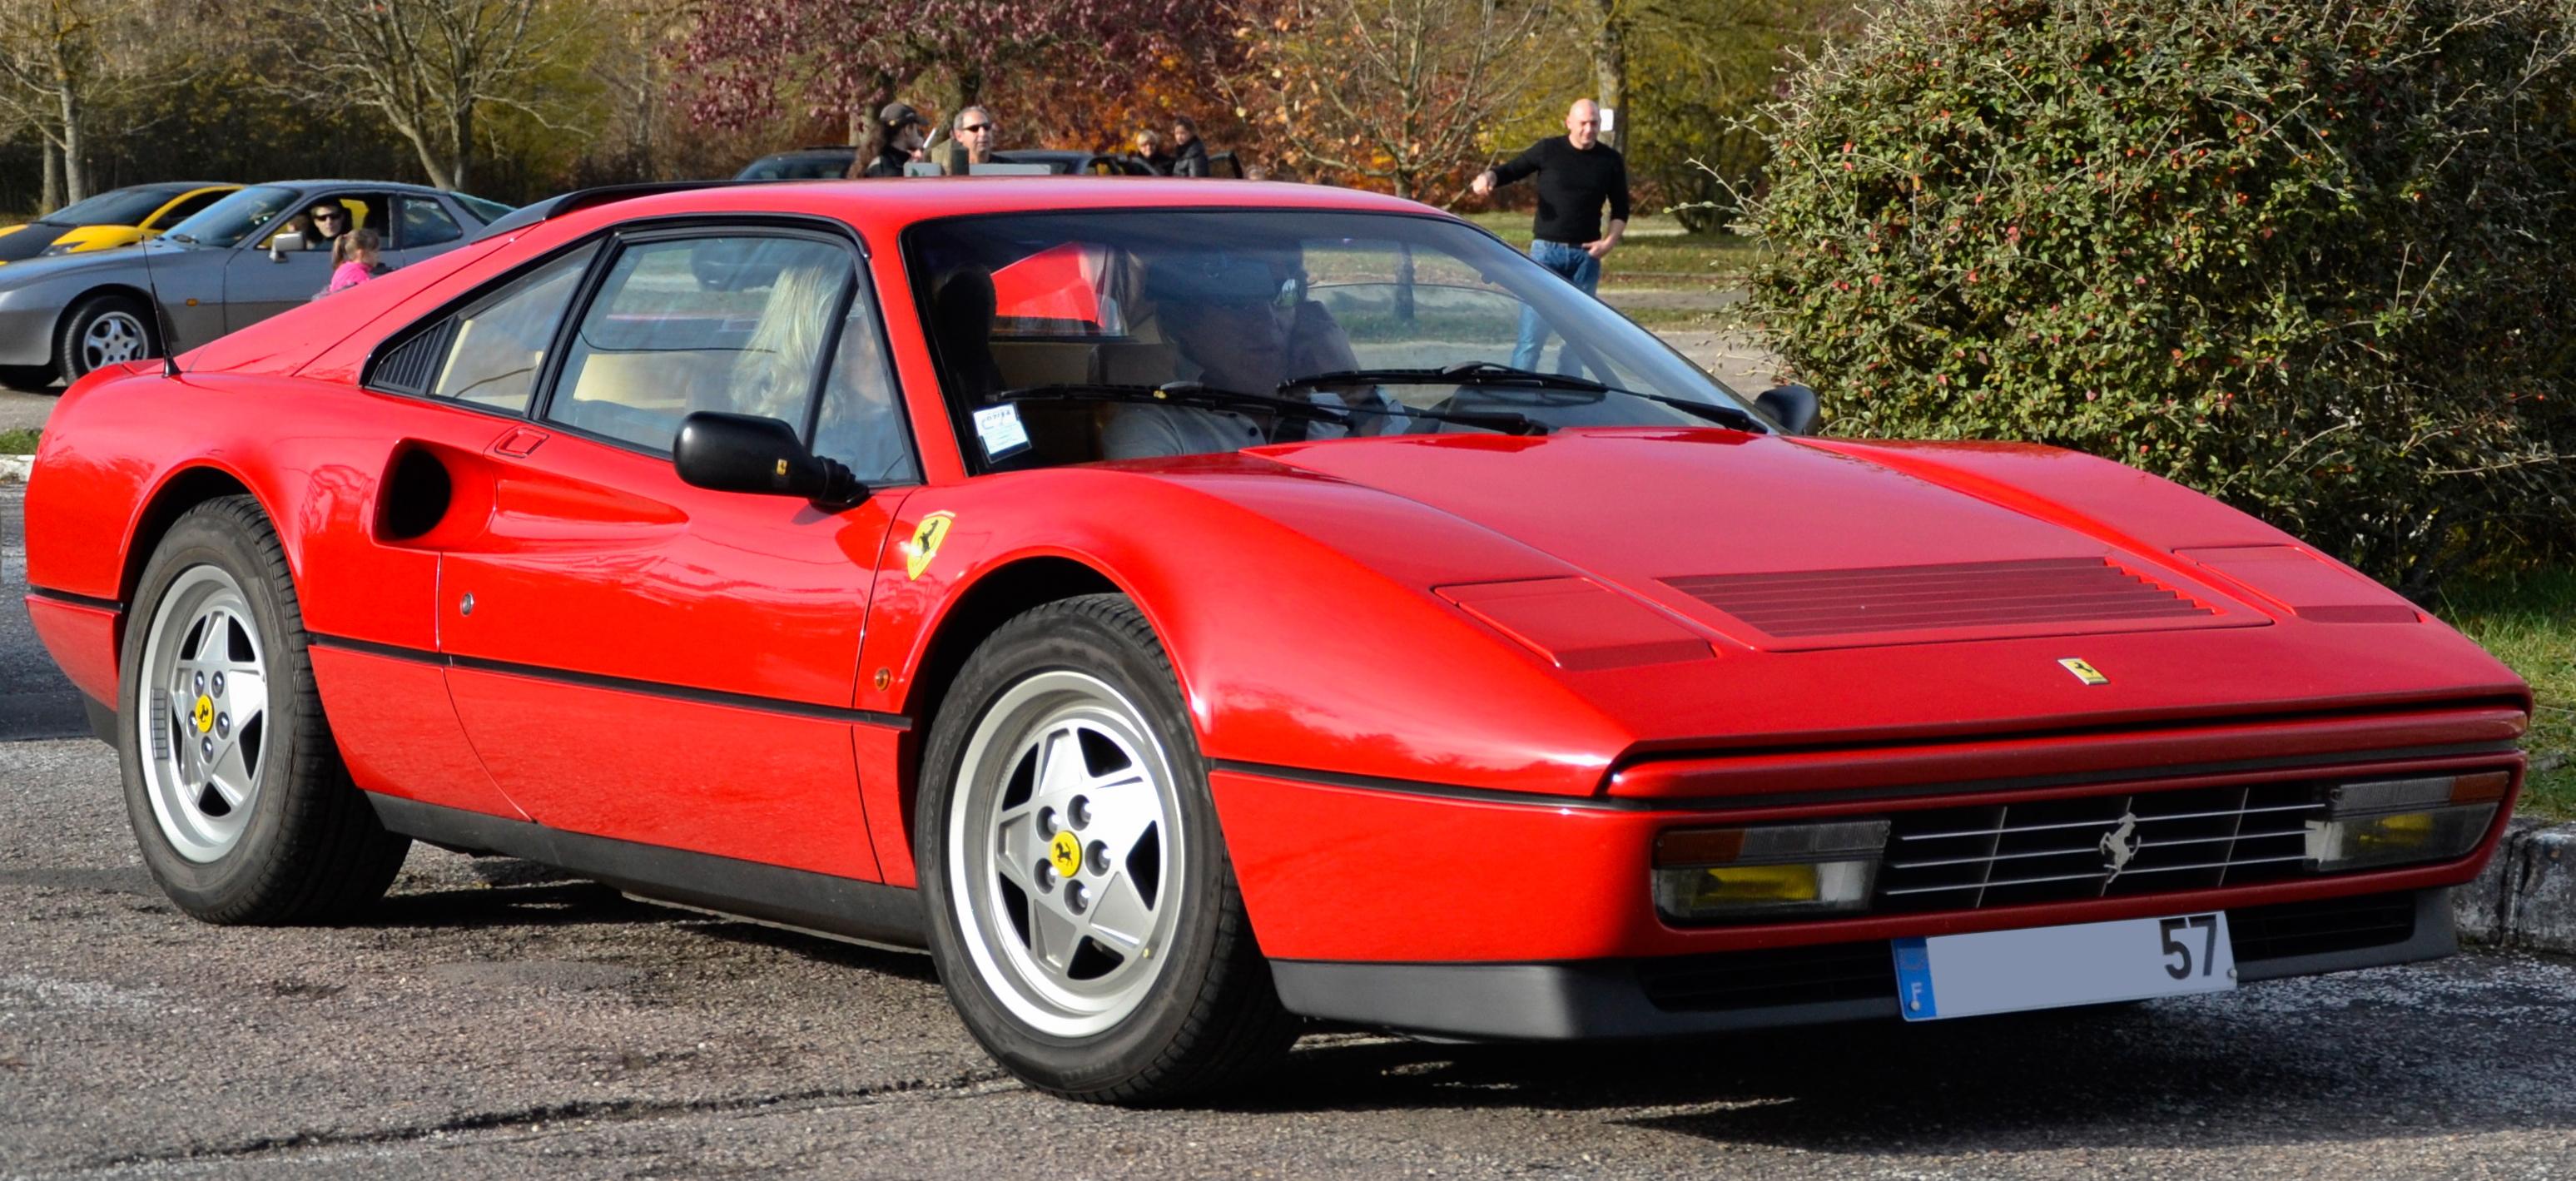 Ferrari_328_GTS_-_Flickr_-_Alexandre_Pr%C3%A9vot_%284%29_%28cropped%29 Remarkable Ferrari Mondial Rear Window Motor Cars Trend